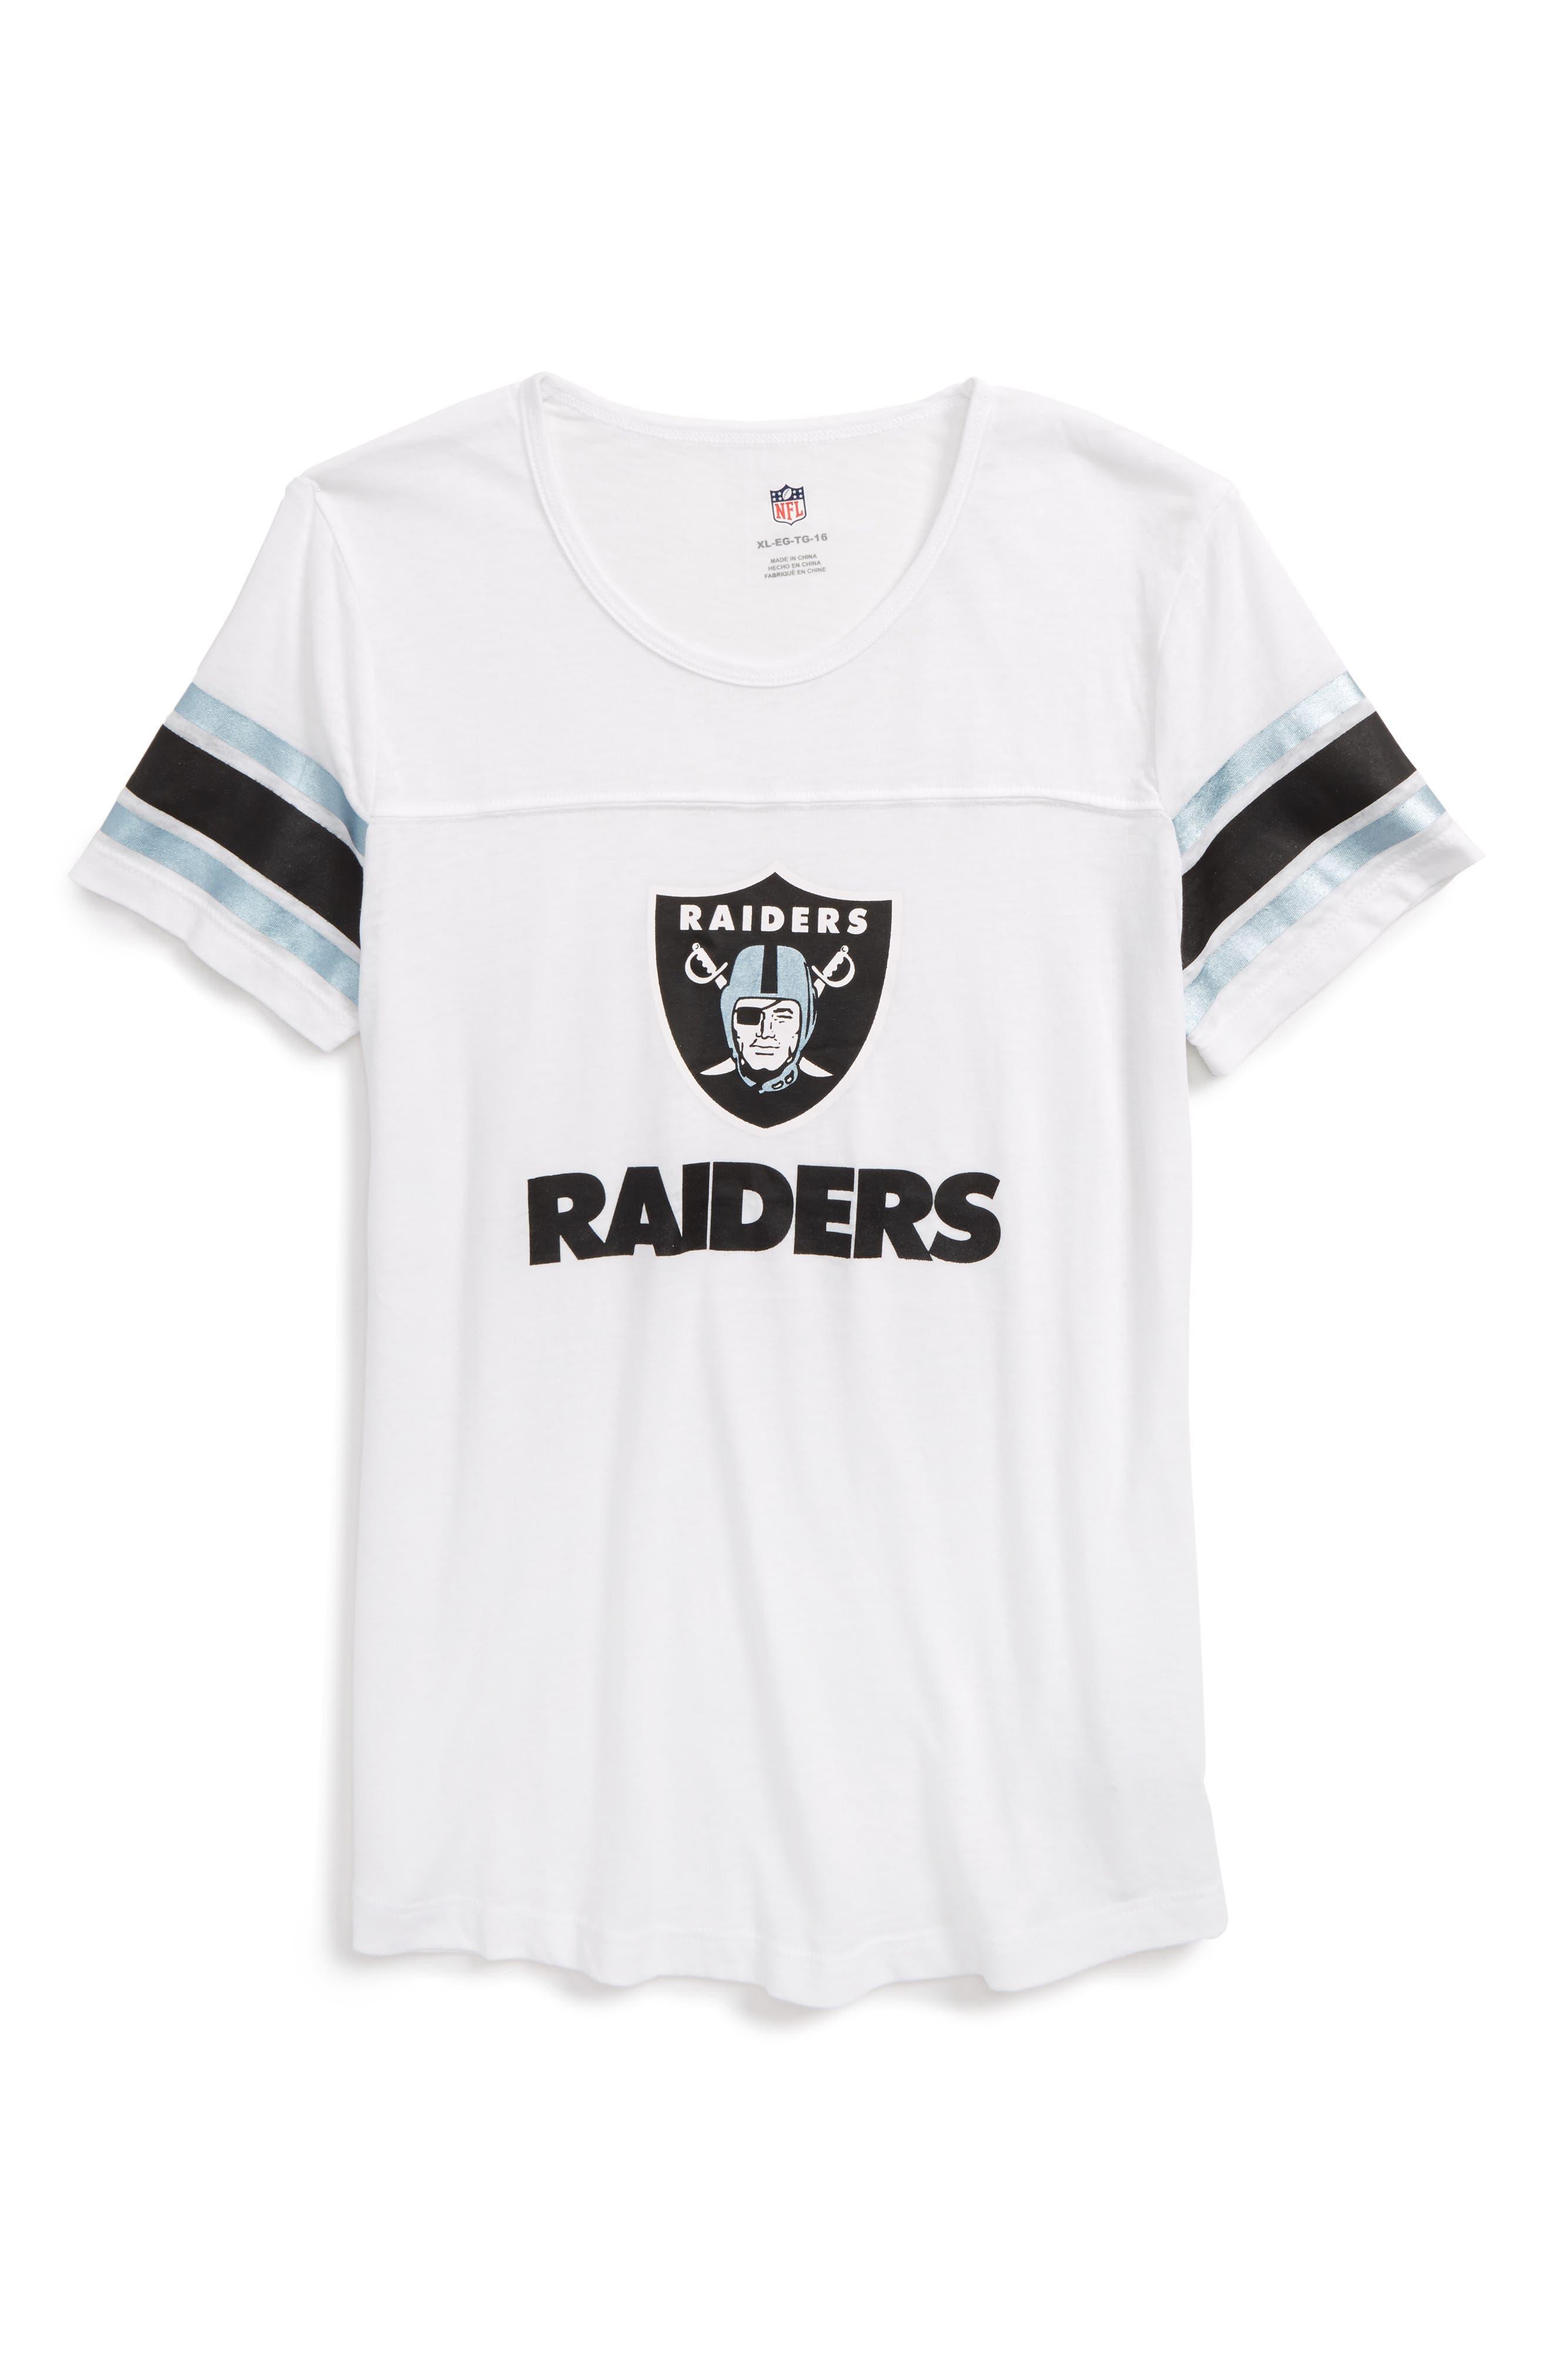 Main Image - Outerstuff NFL Oakland Raiders Team Pride Tee (Big Girls)